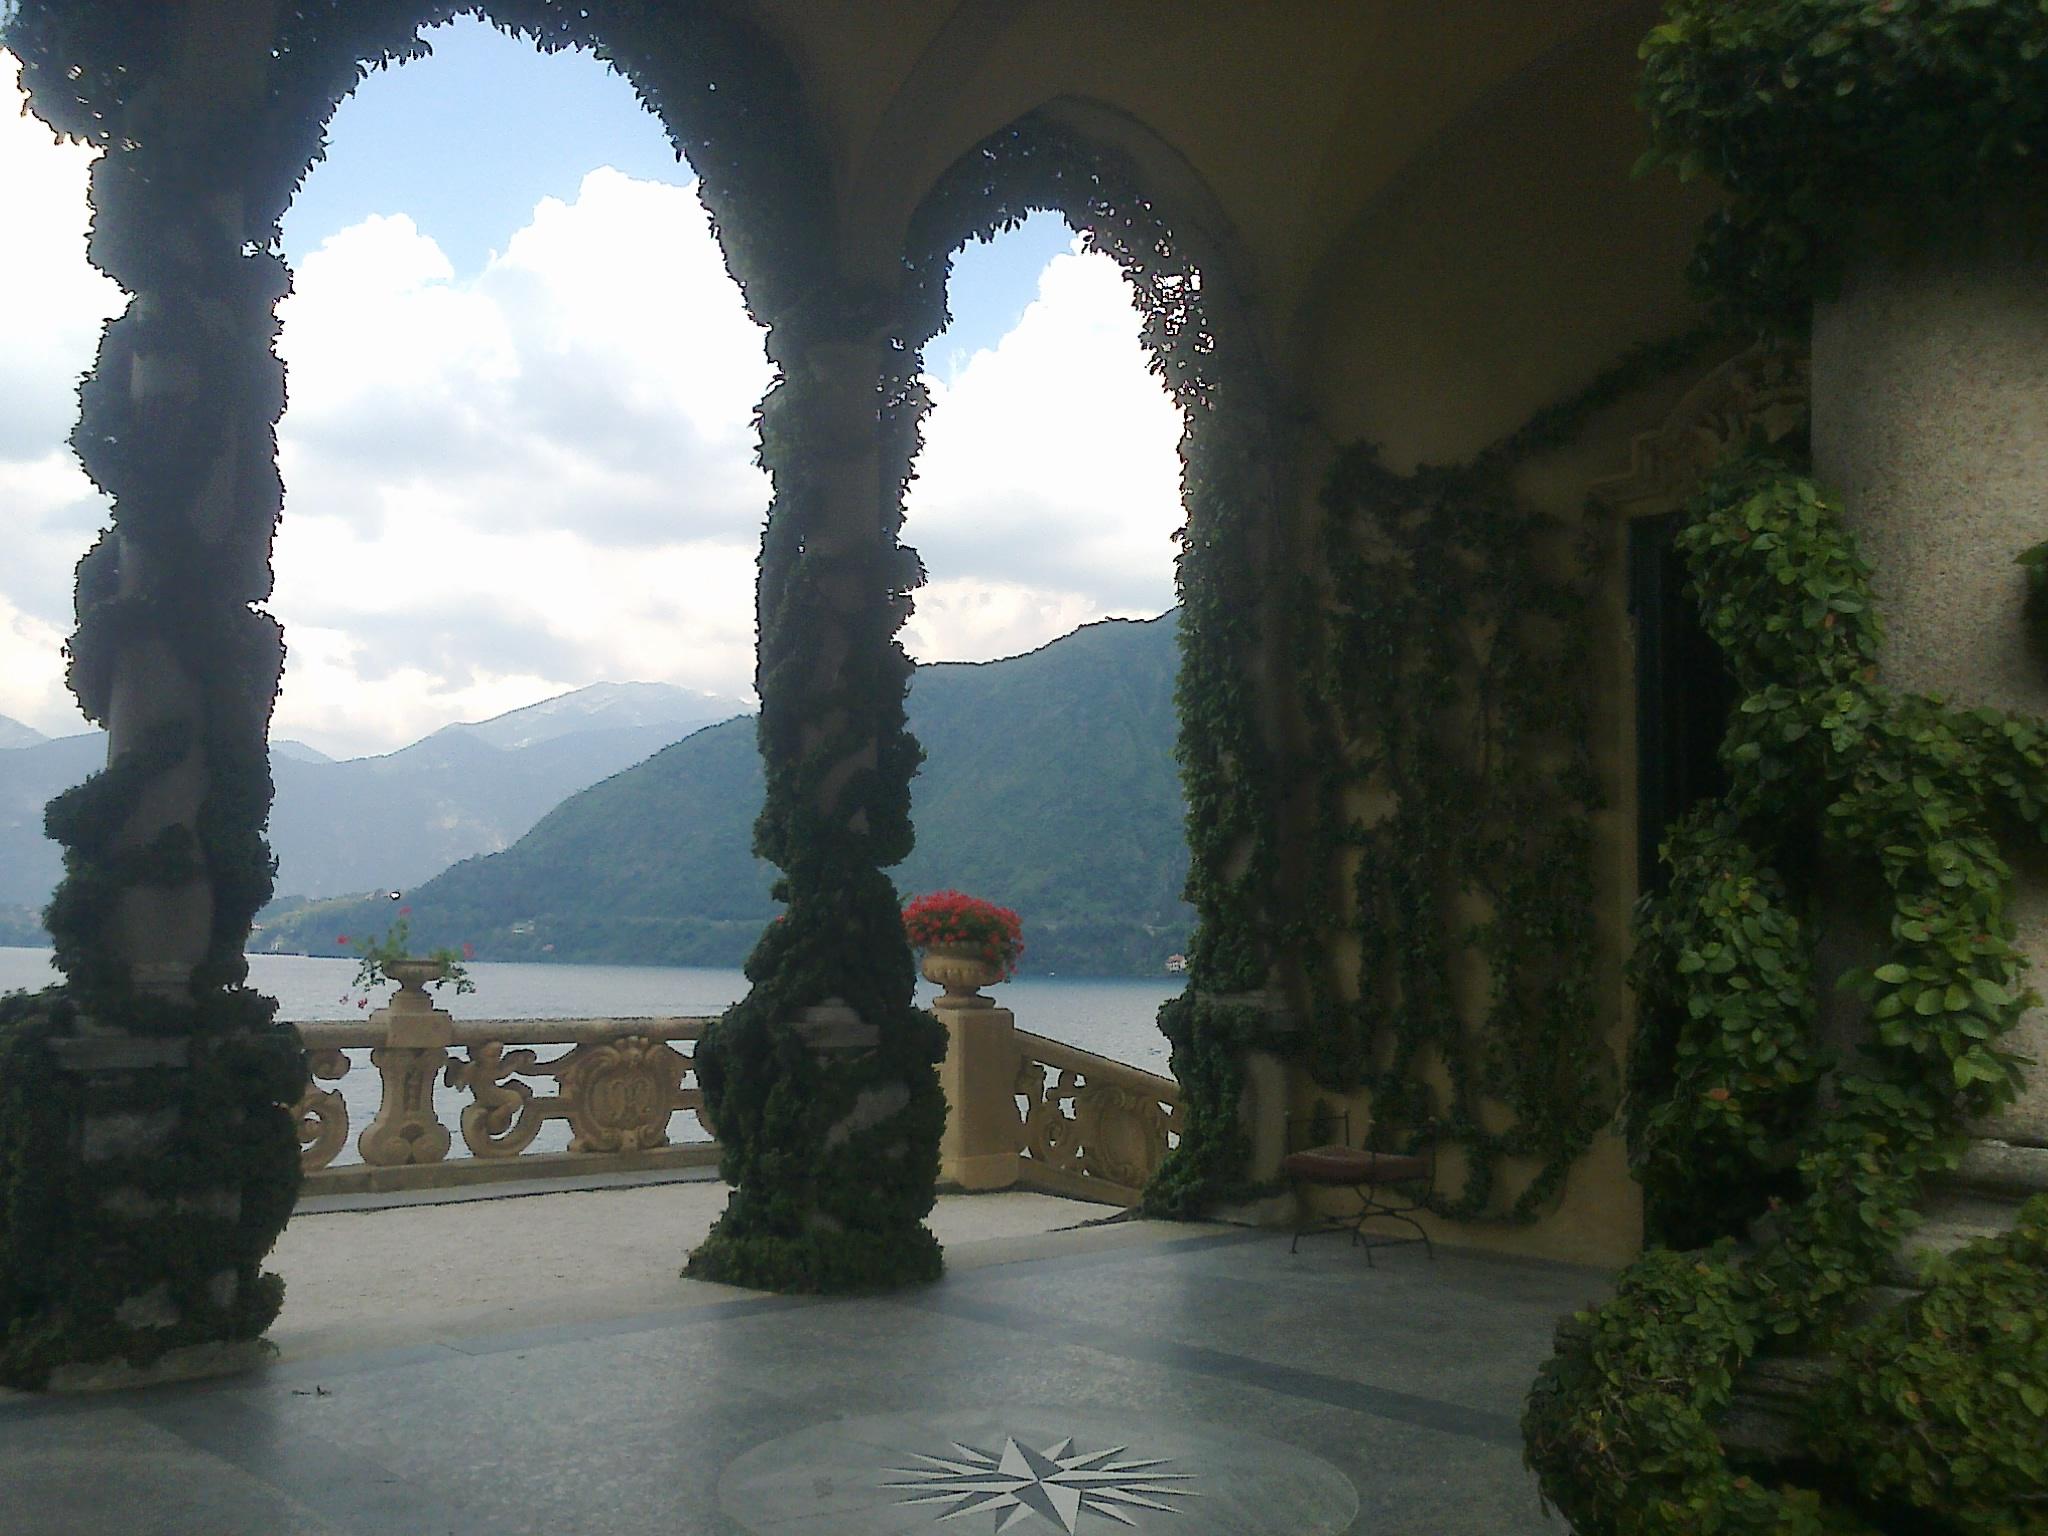 Вилла Бальбьянелло, Ленно, озеро Комо